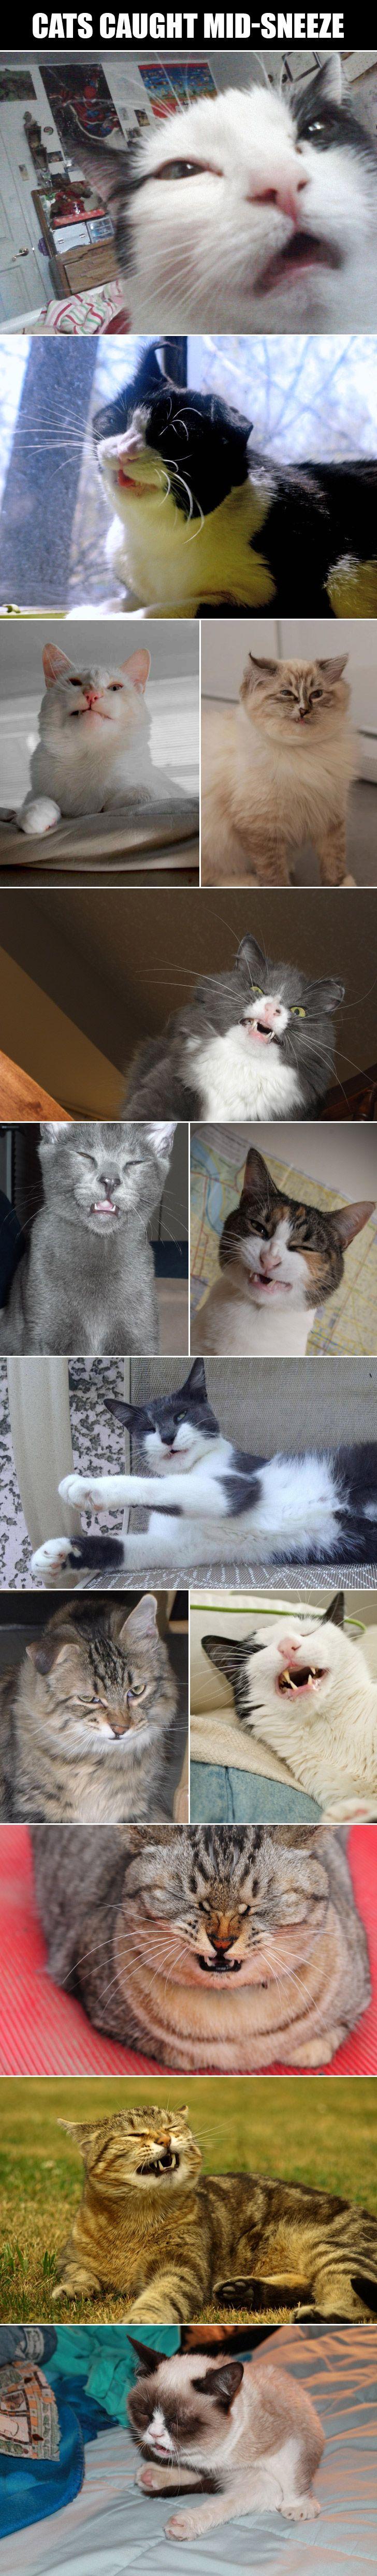 Cats caught mid-sneeze.